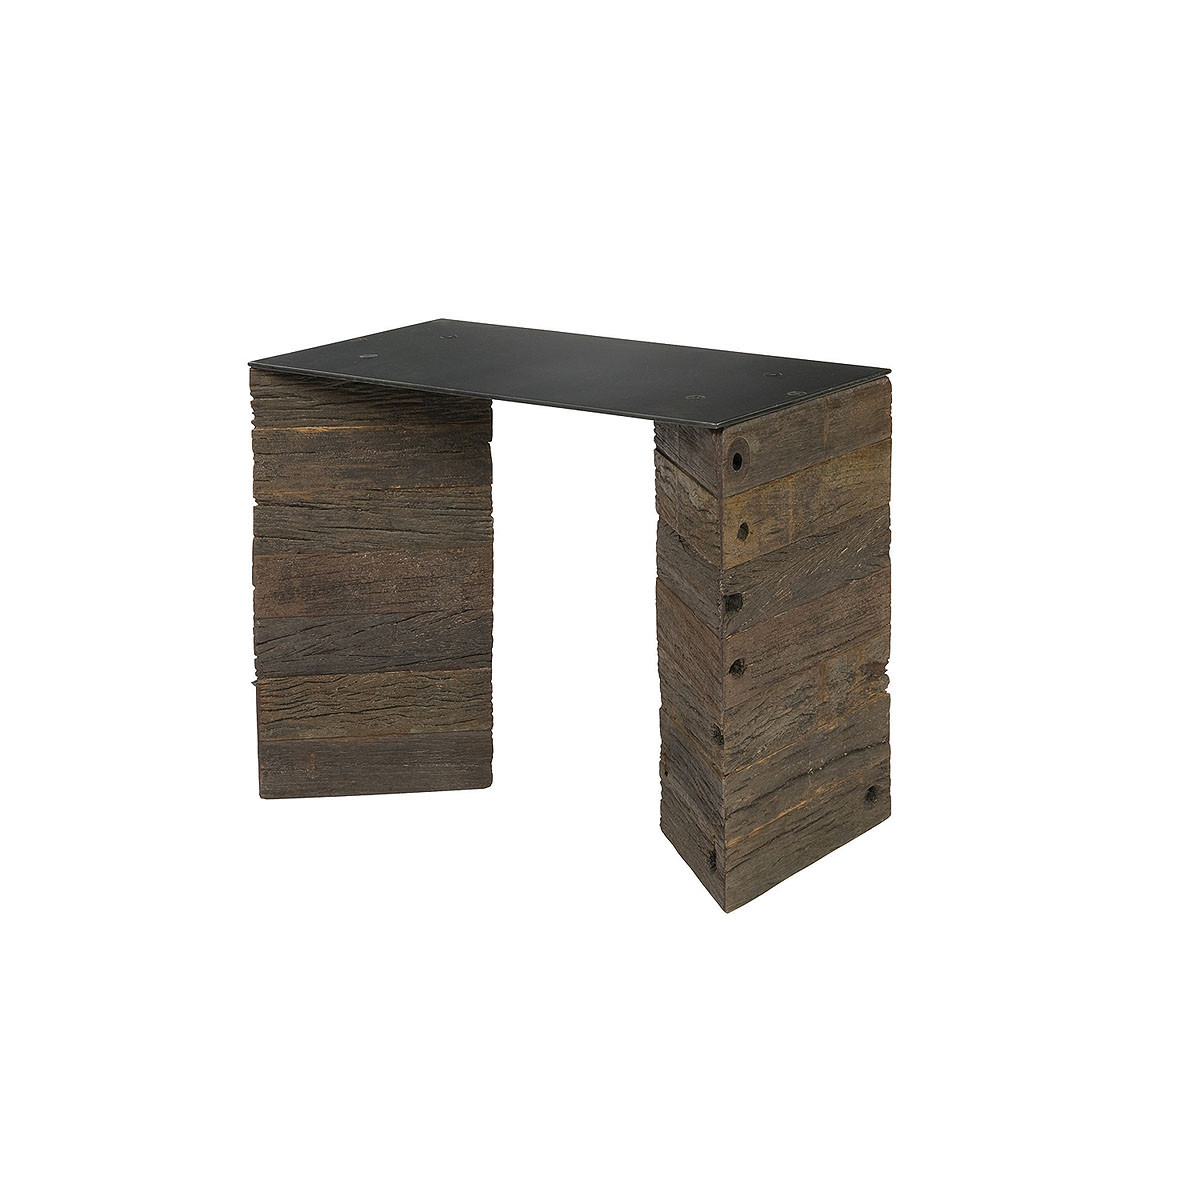 Reclaimed Wood Furniture Urban Hardwoods Images Laminated